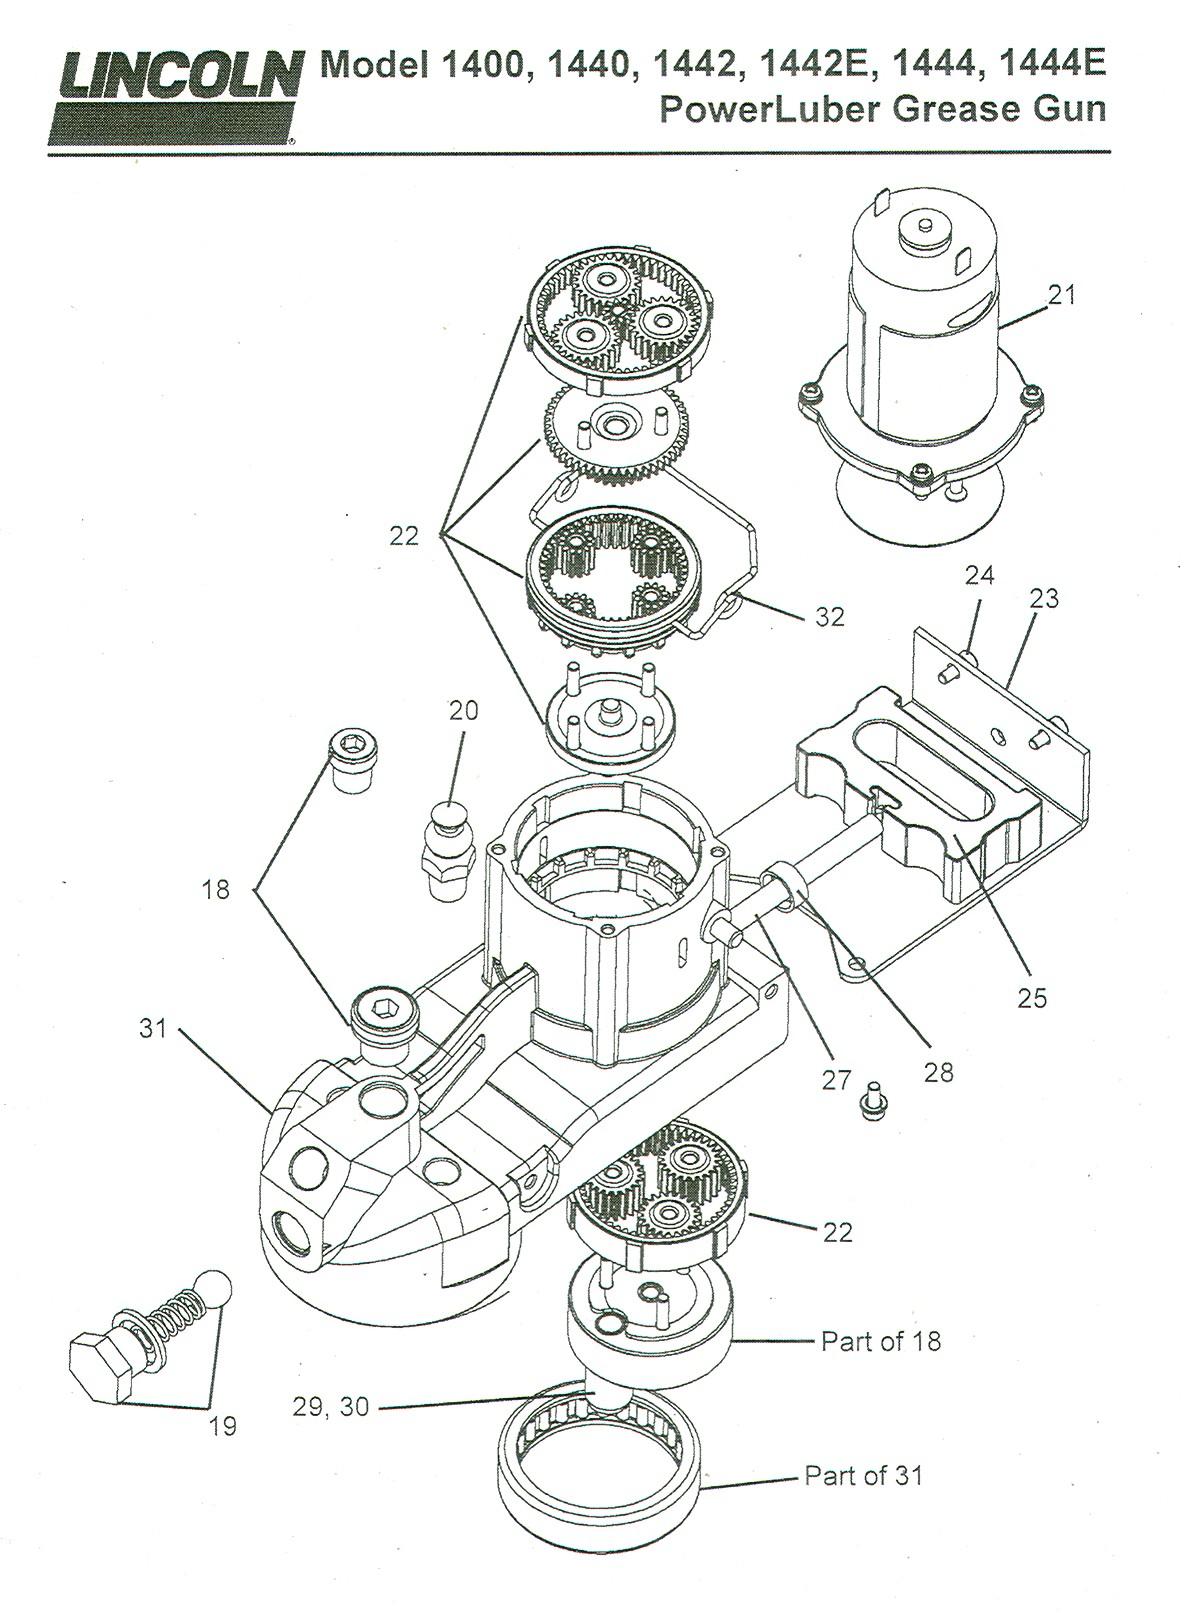 1400_series_a_schematic_inside_parts.jpg (343756 bytes)